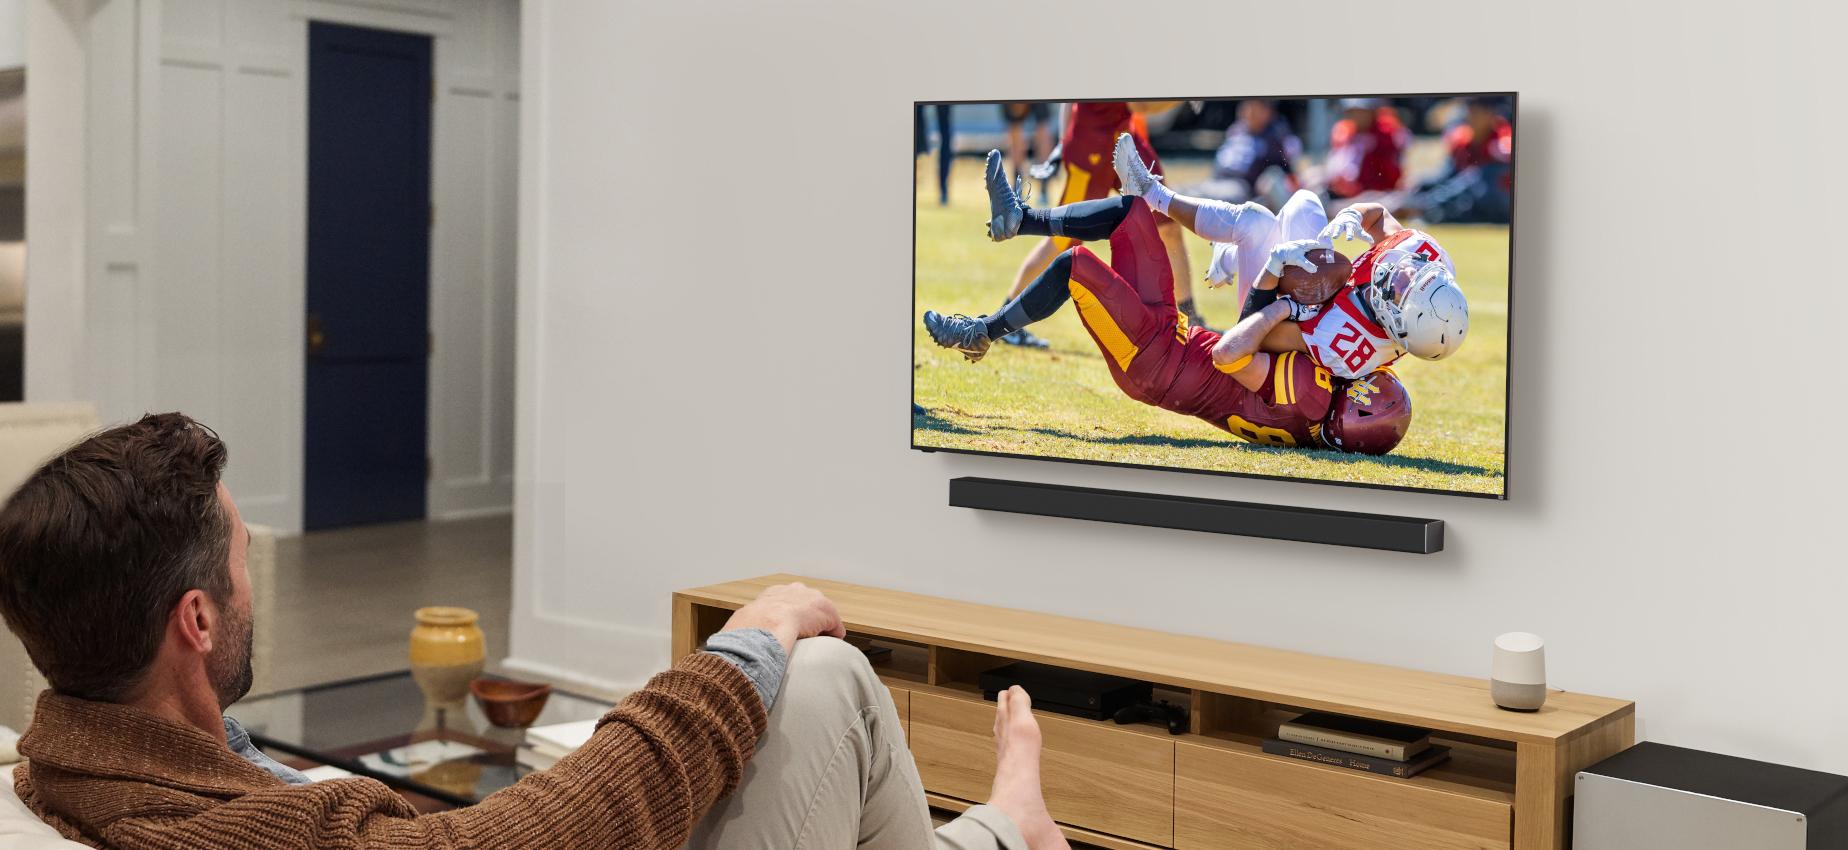 Watch Blu-ray movies on Vizio P-Series TV via USB port